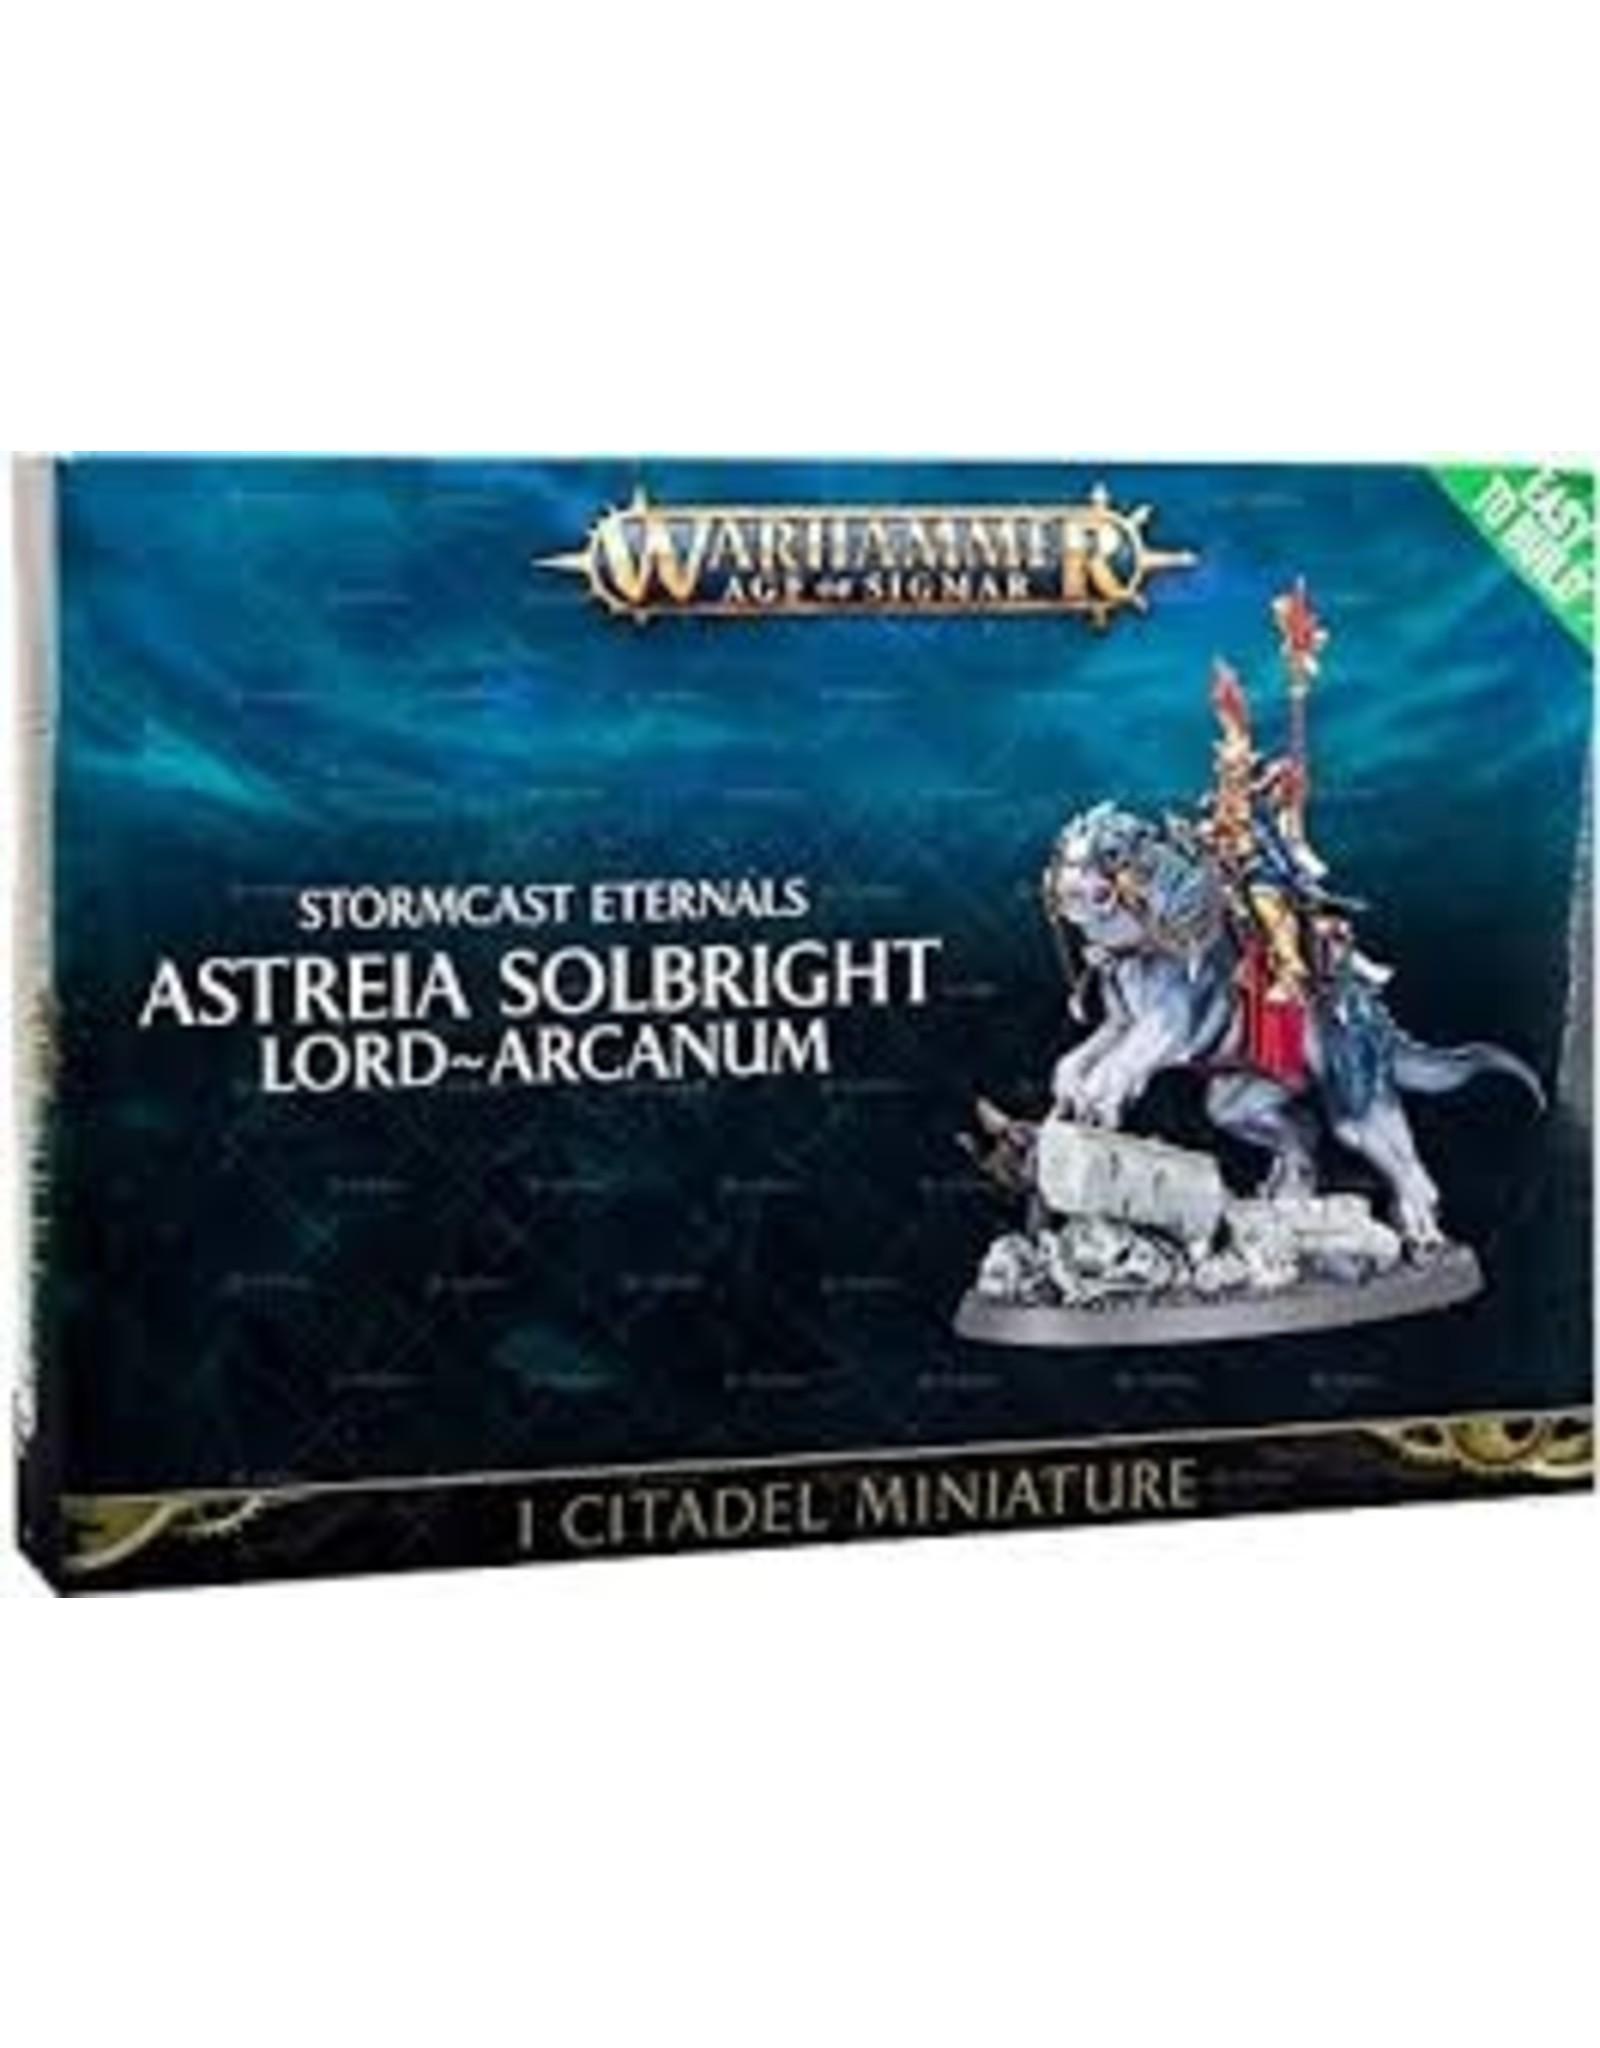 Age of Sigmar Astreia Solbright, Lord-Arcanum